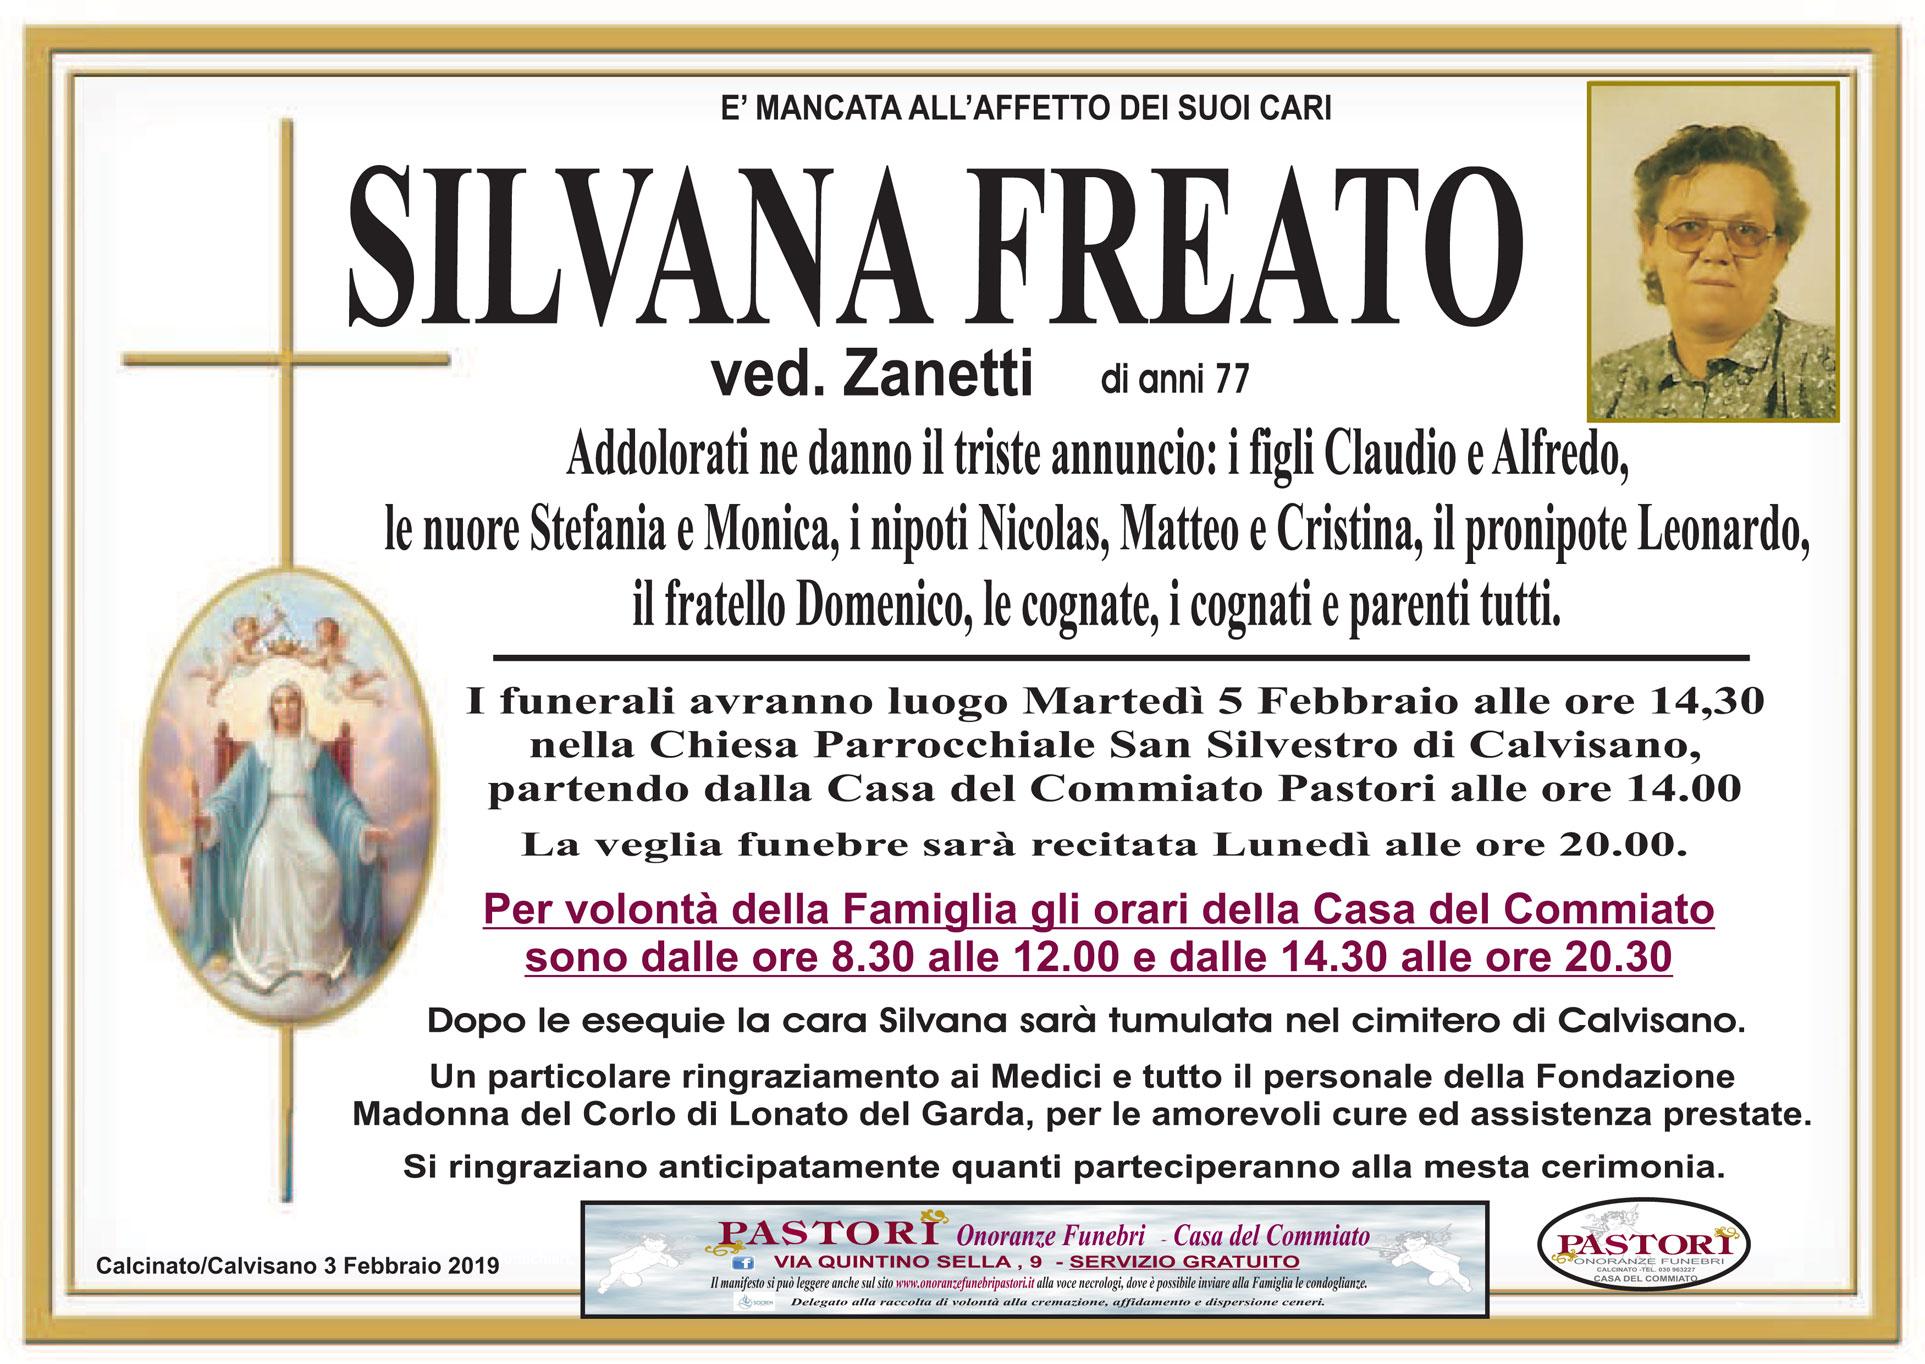 Silvana Freato